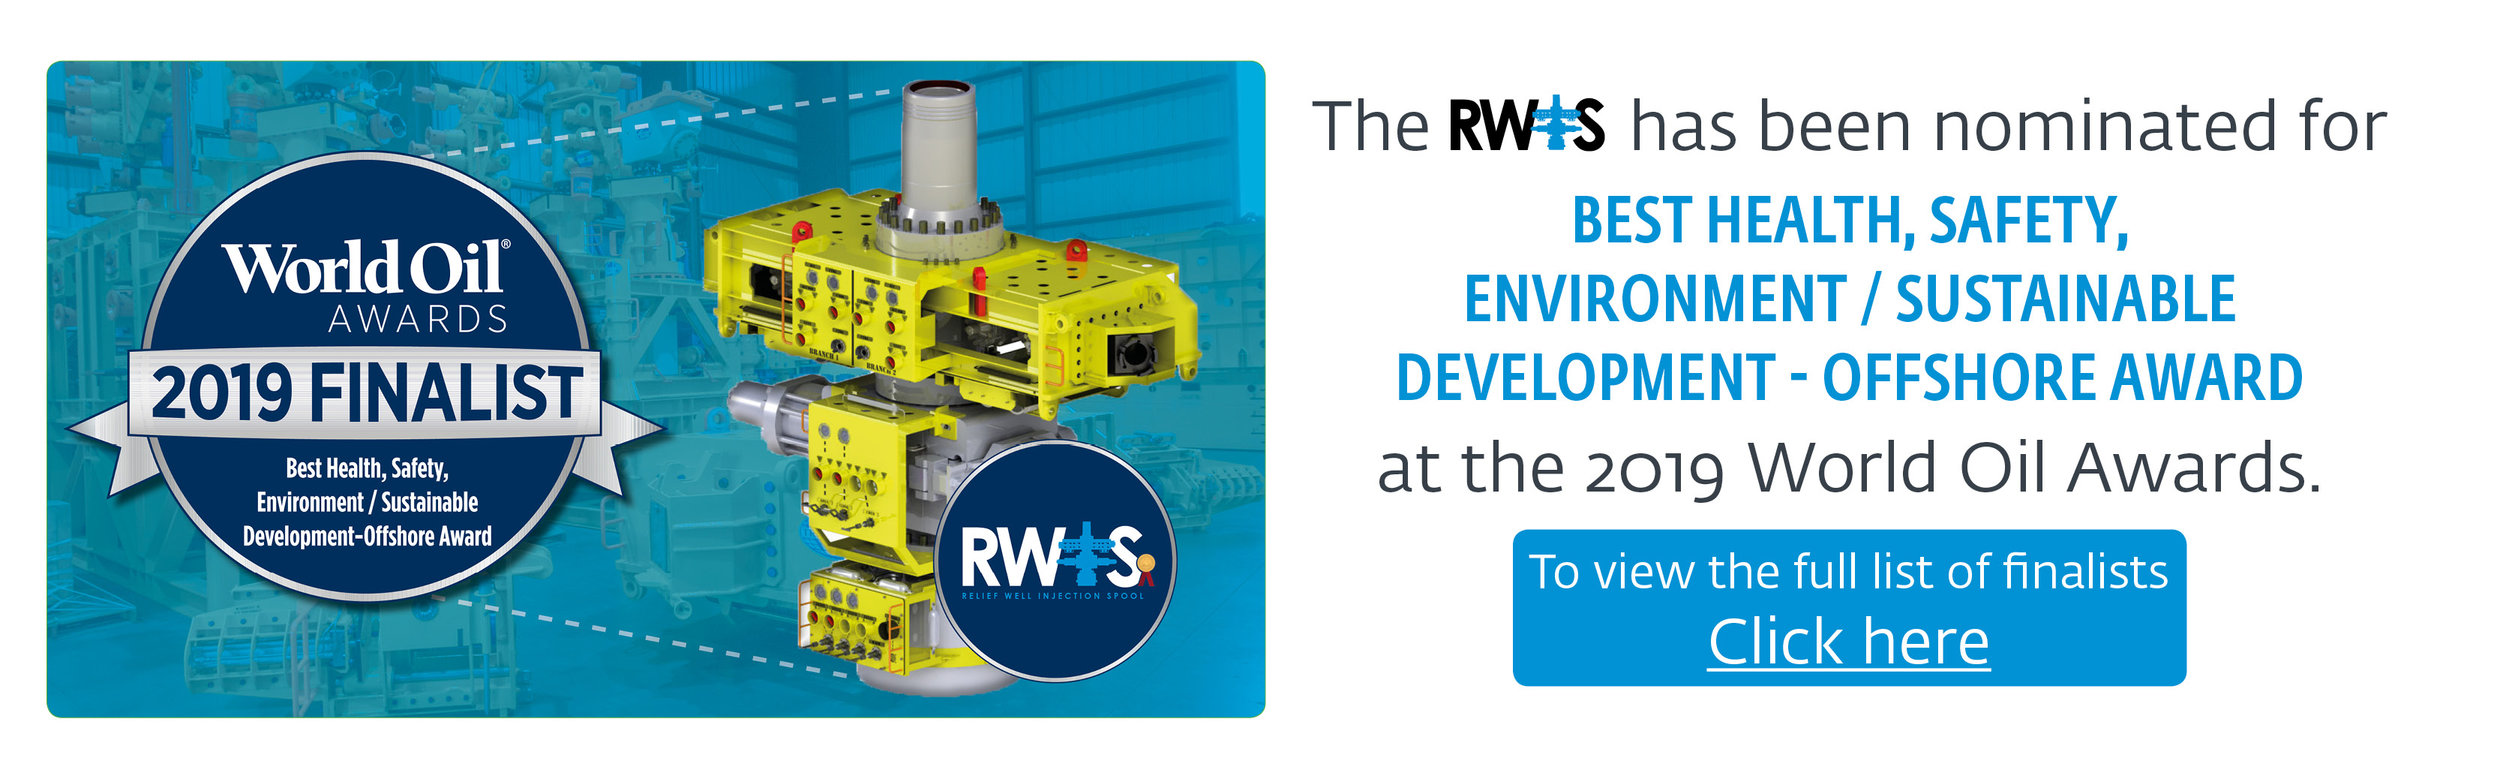 AE_Web_Button_RWIS_Award2.jpg